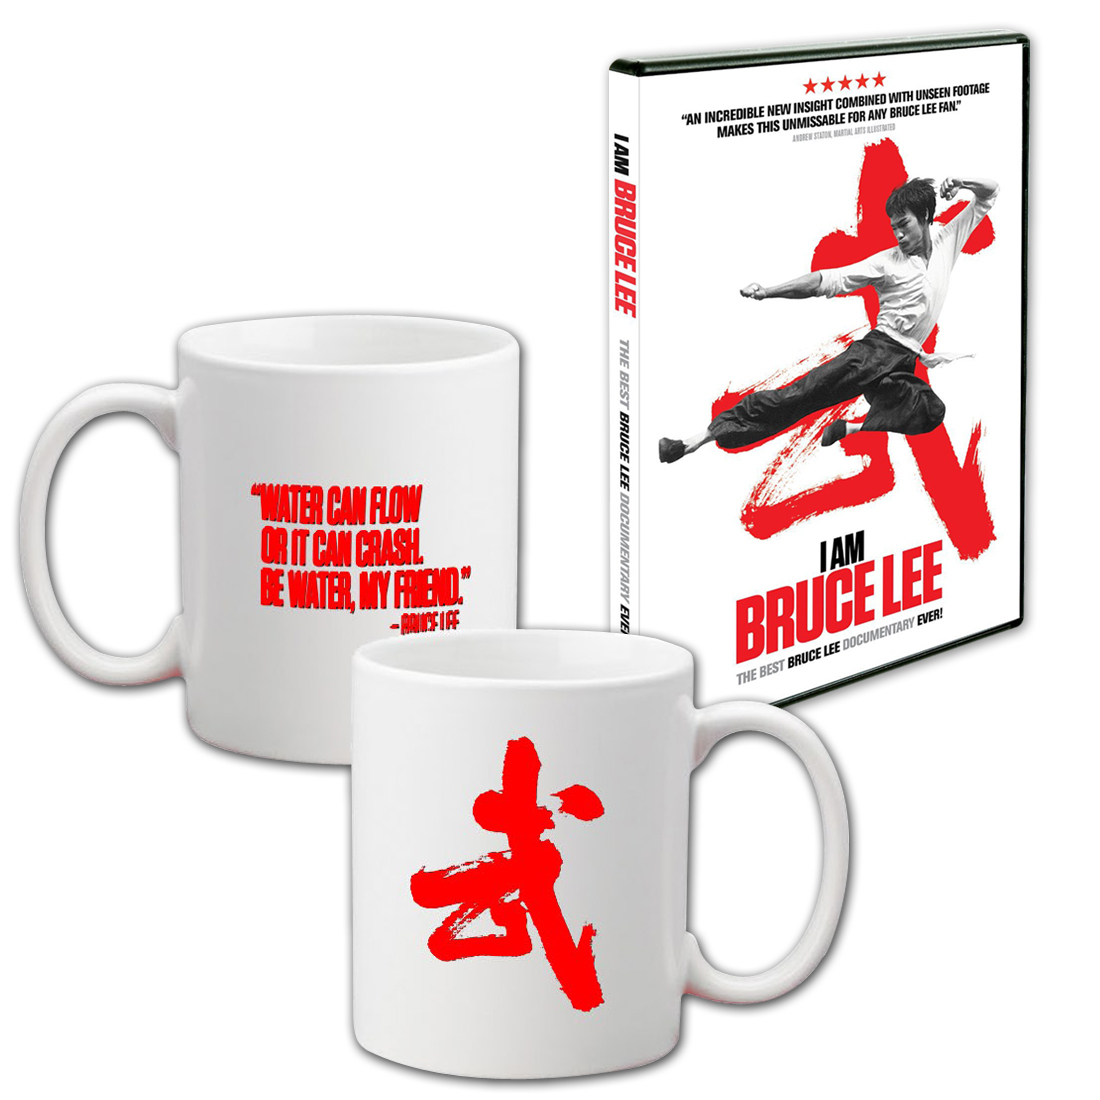 I Am Bruce Lee Mug/DVD Combo